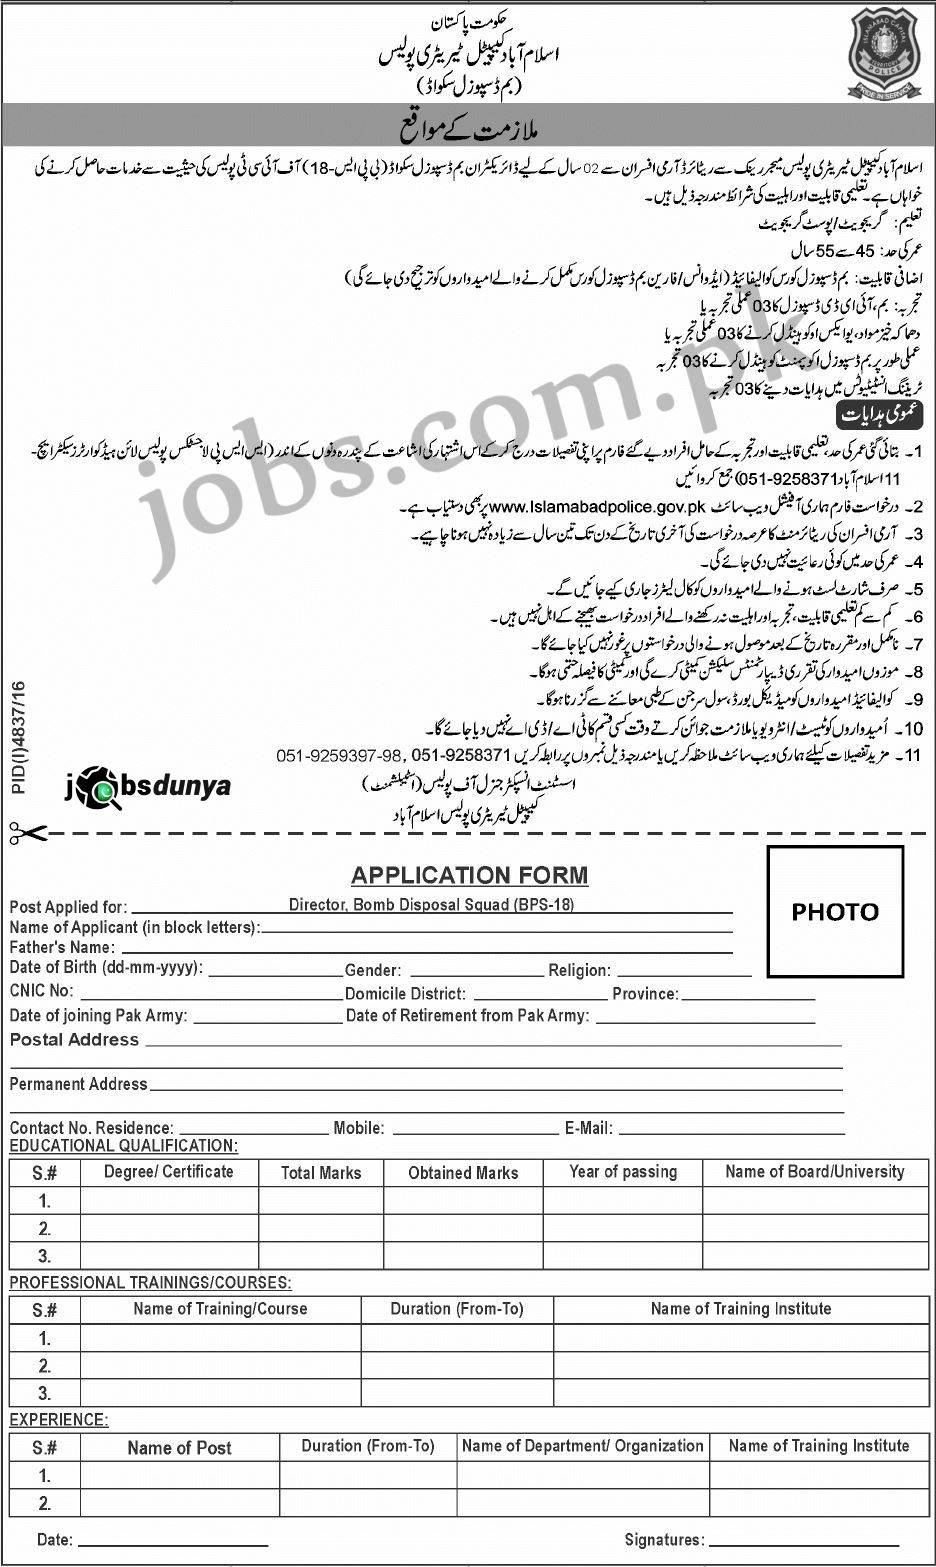 Islamabad Capital Territory Ict Police Jobs 2017 Download